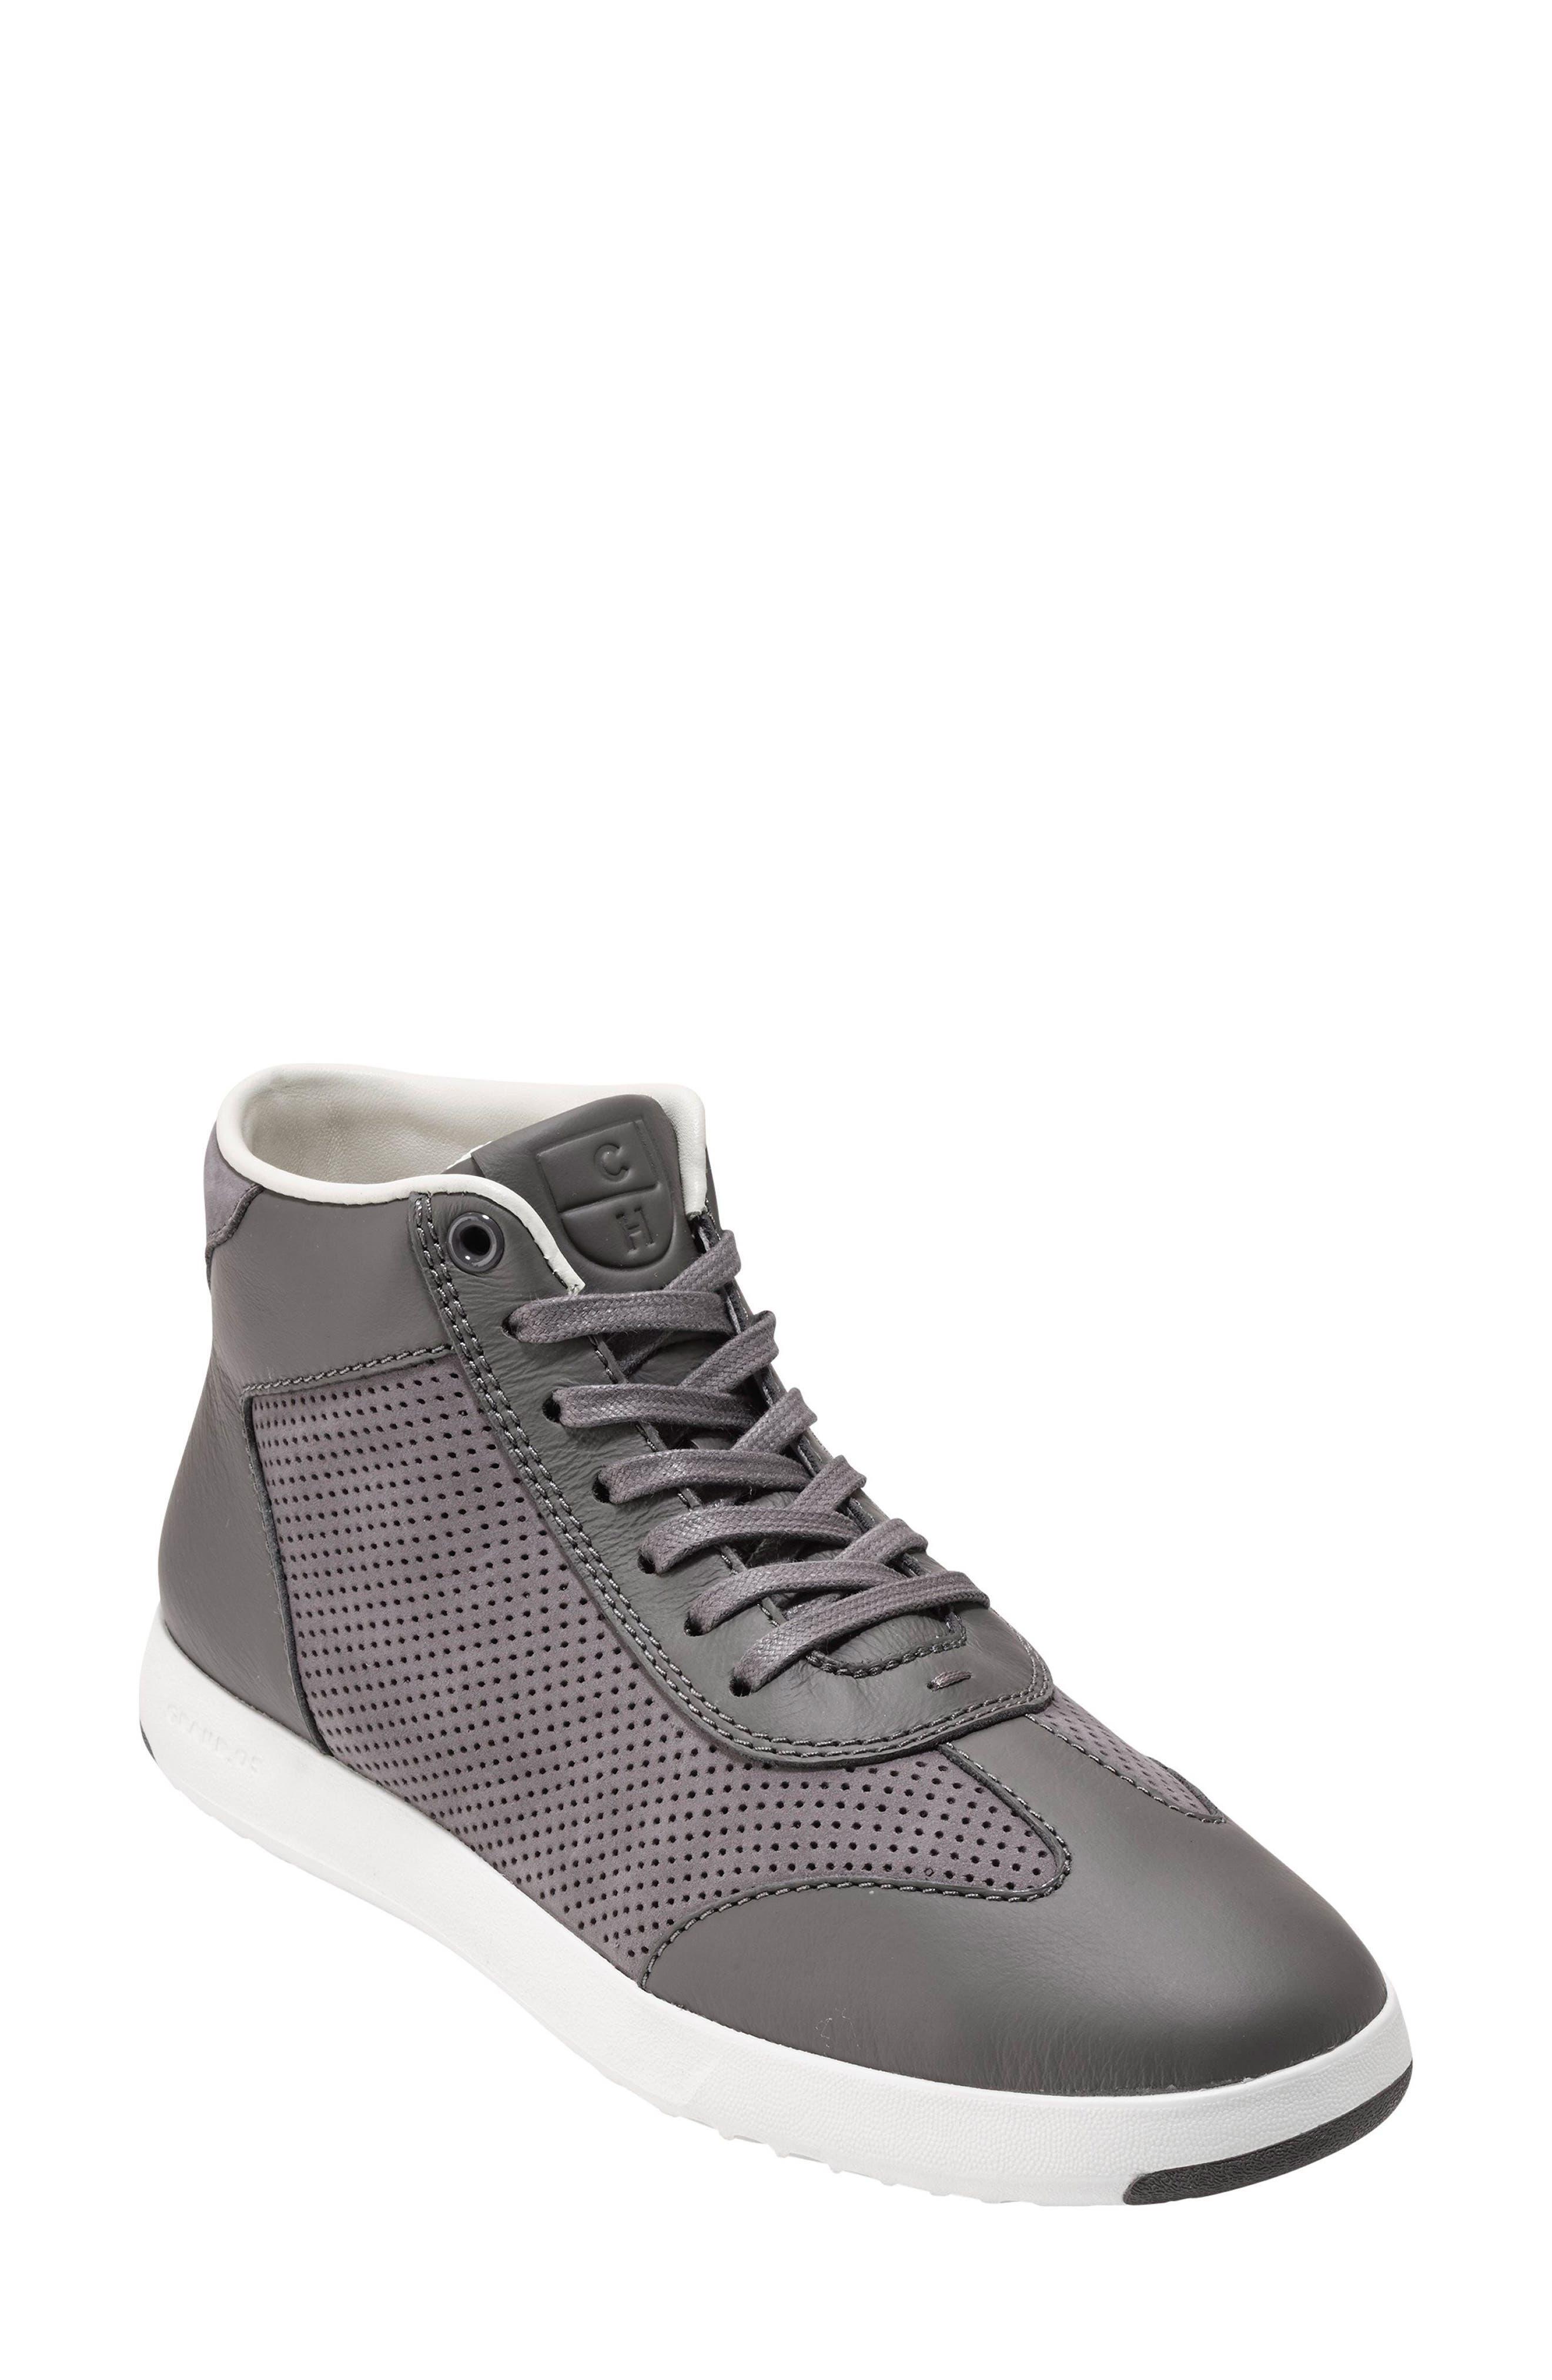 GrandPro High Top Sneaker,                         Main,                         color, 025